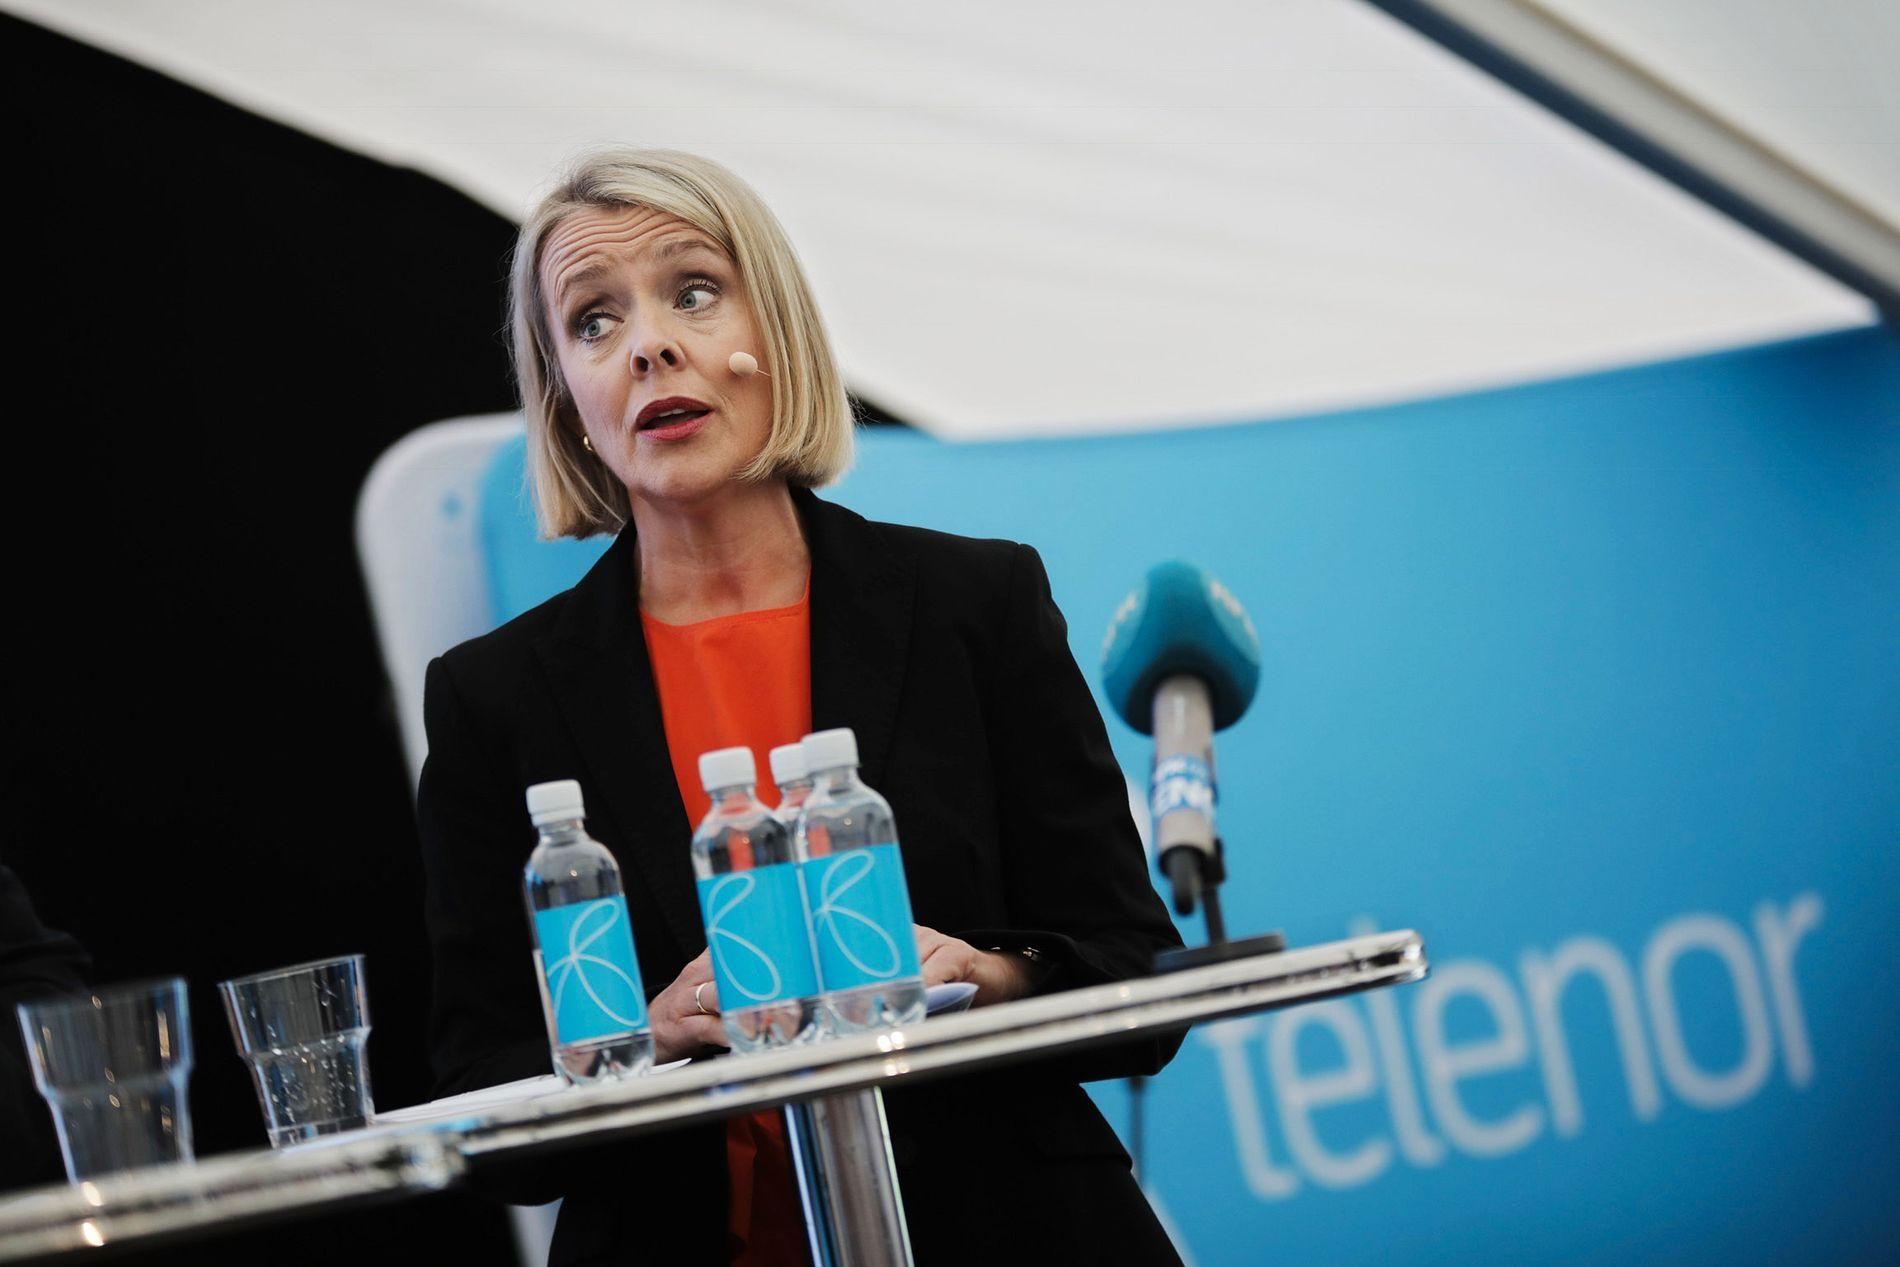 PST-sjef Benedicte Bjørnland var i debatt om forebyggende digital sikkerhet i Arendal onsdag morgen.